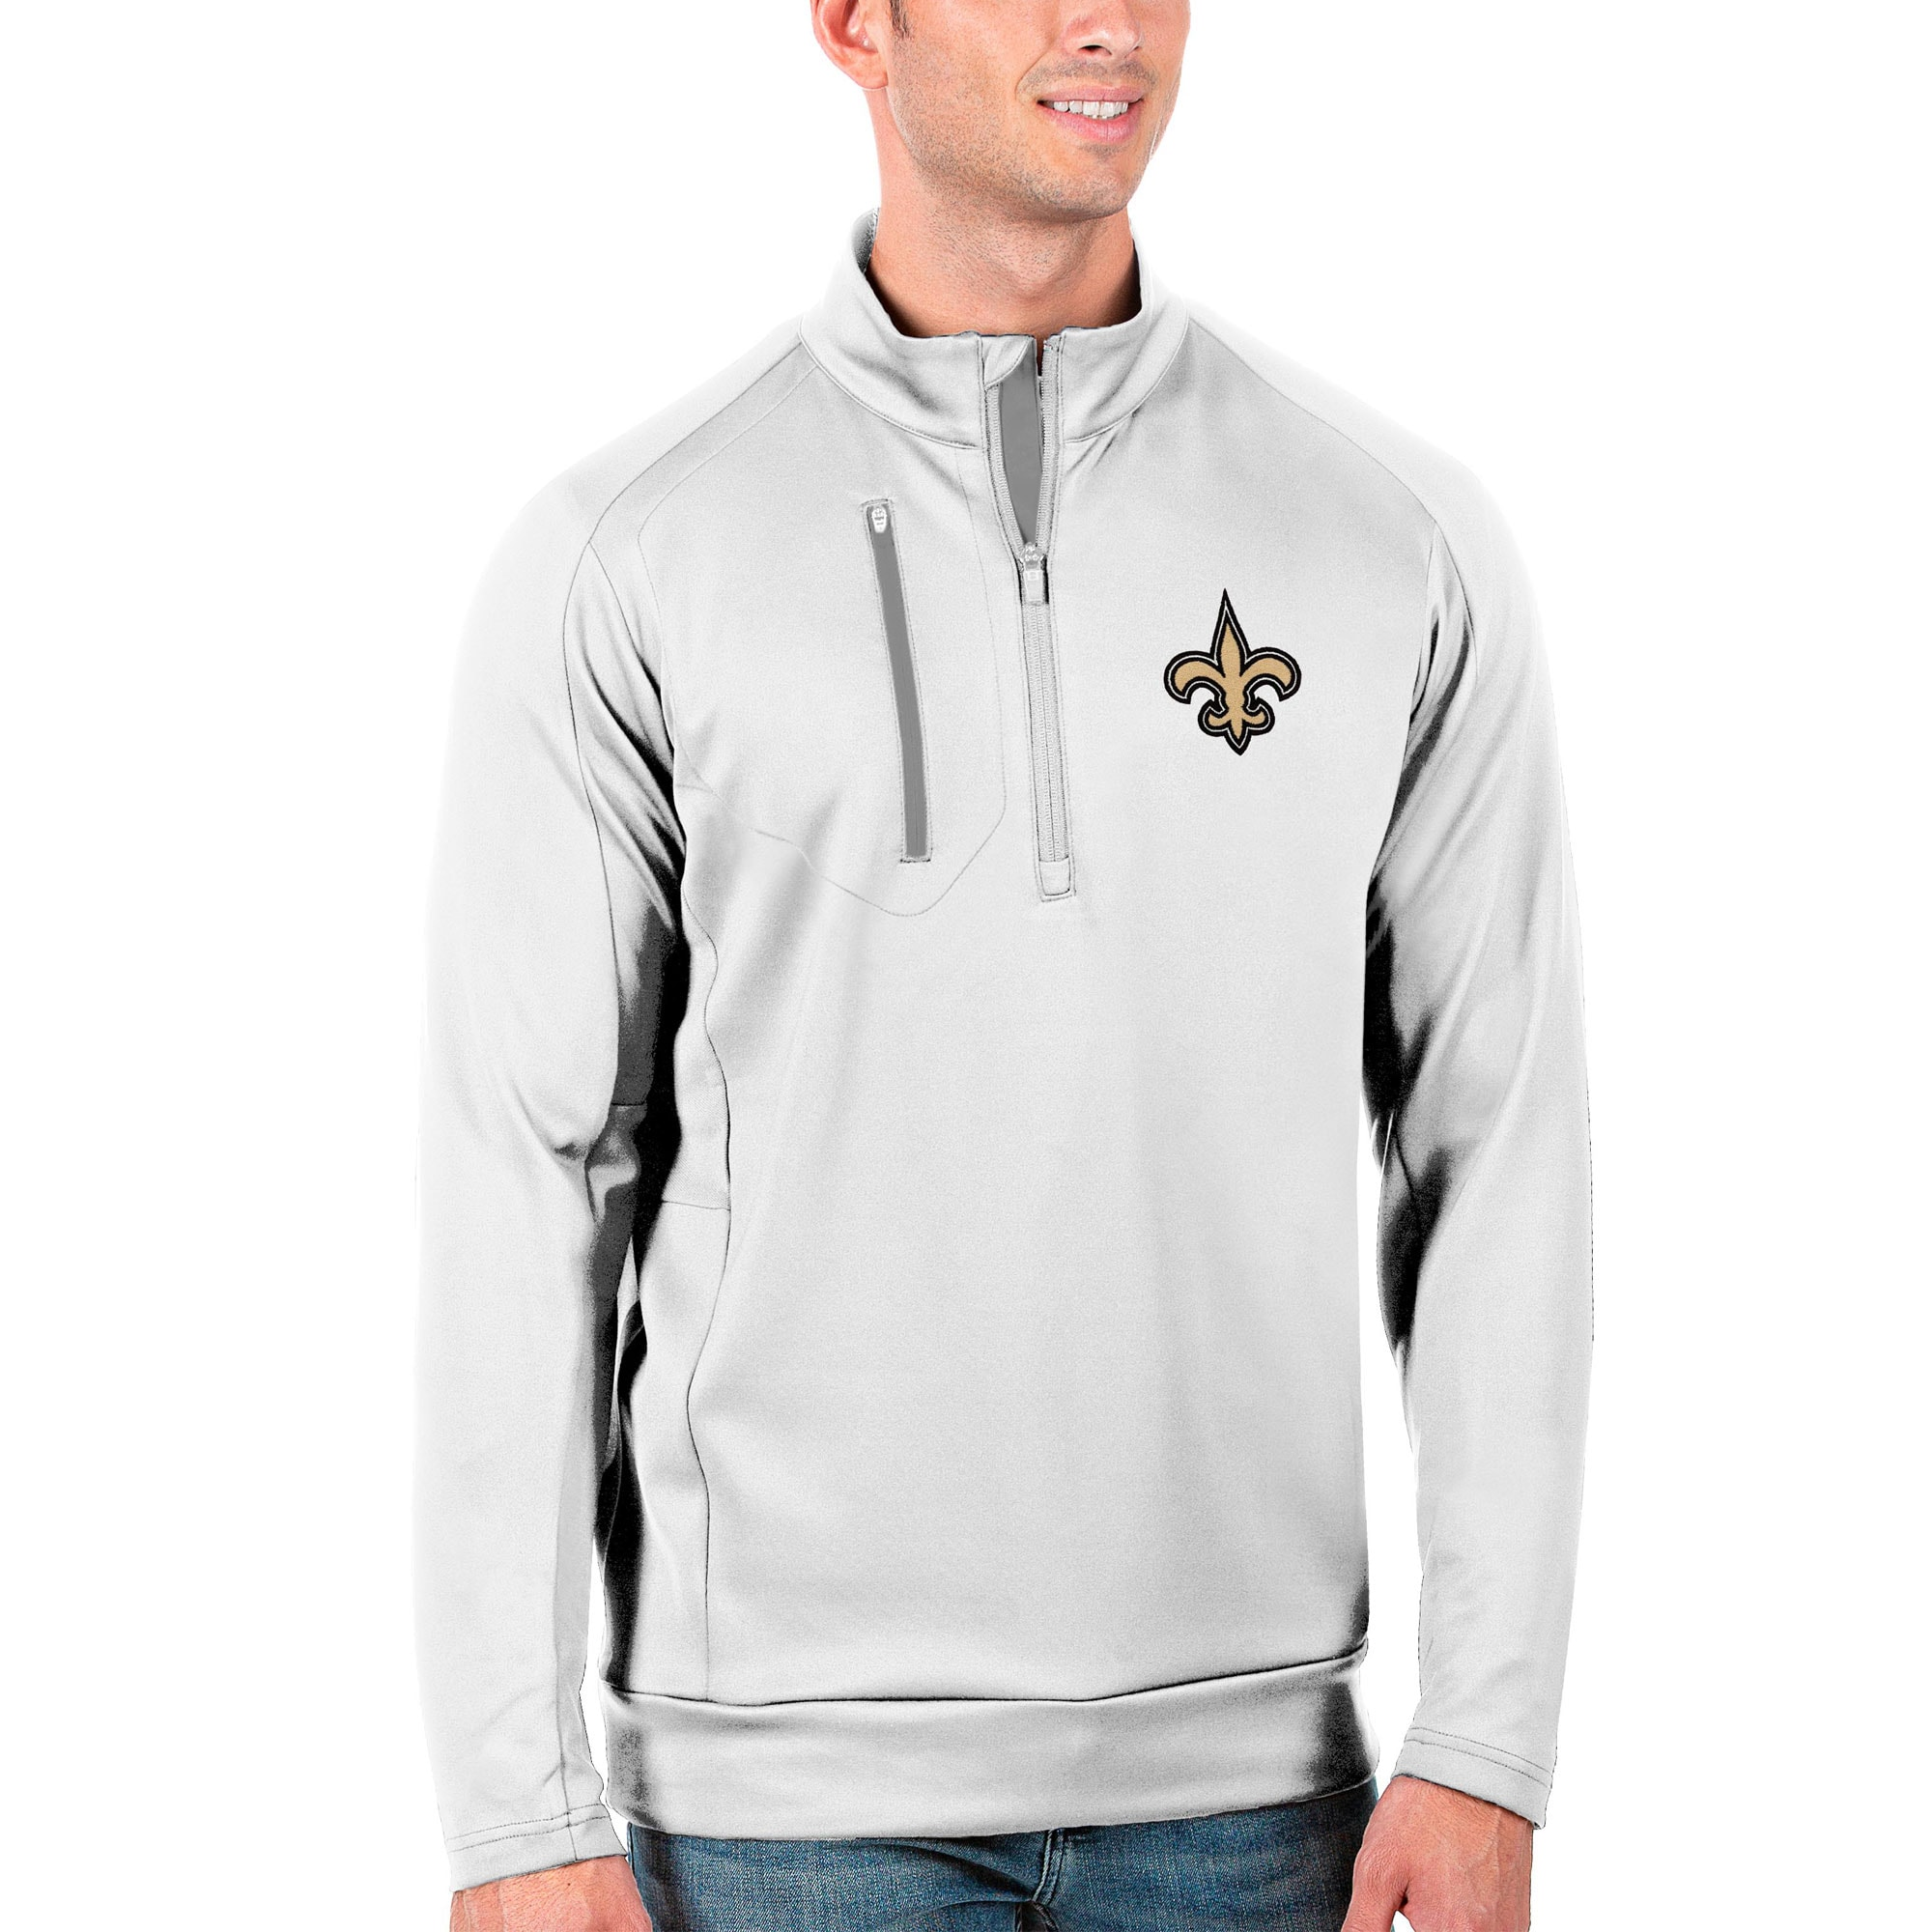 New Orleans Saints Antigua Generation Quarter-Zip Pullover Jacket - White/Silver